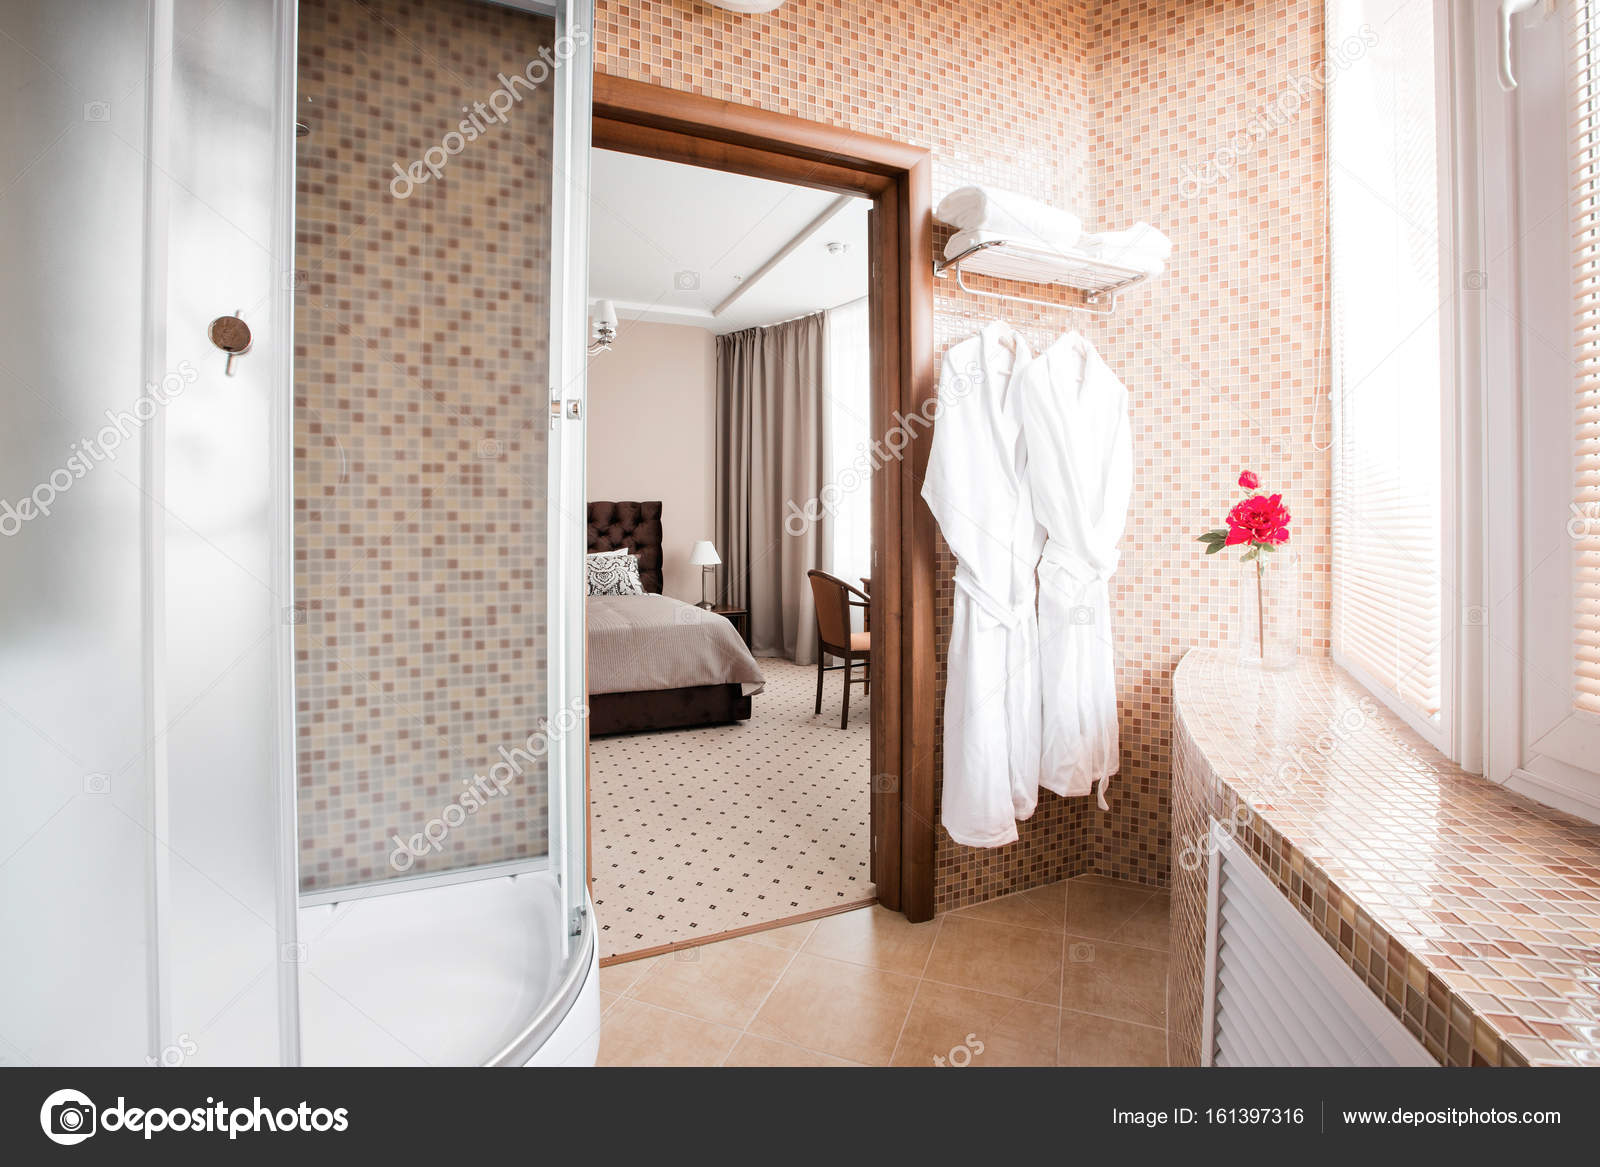 Bad novellini badwanden douchecabine bad in één product badezimmer